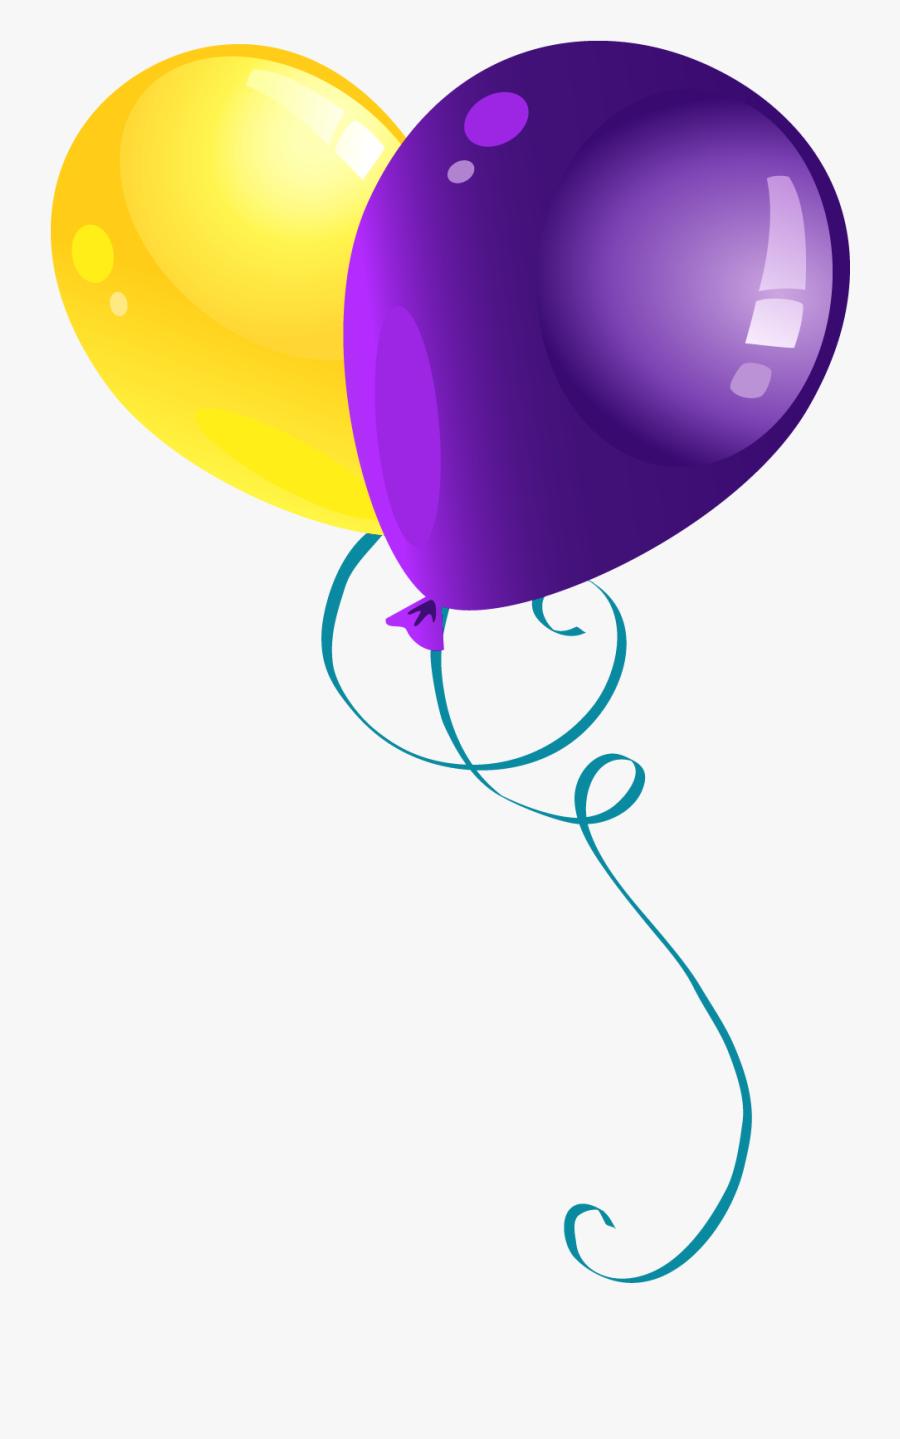 Clip Royalty Free Ballons Globos Boxes Pinterest - Globos De Cumpleaños Png, Transparent Clipart